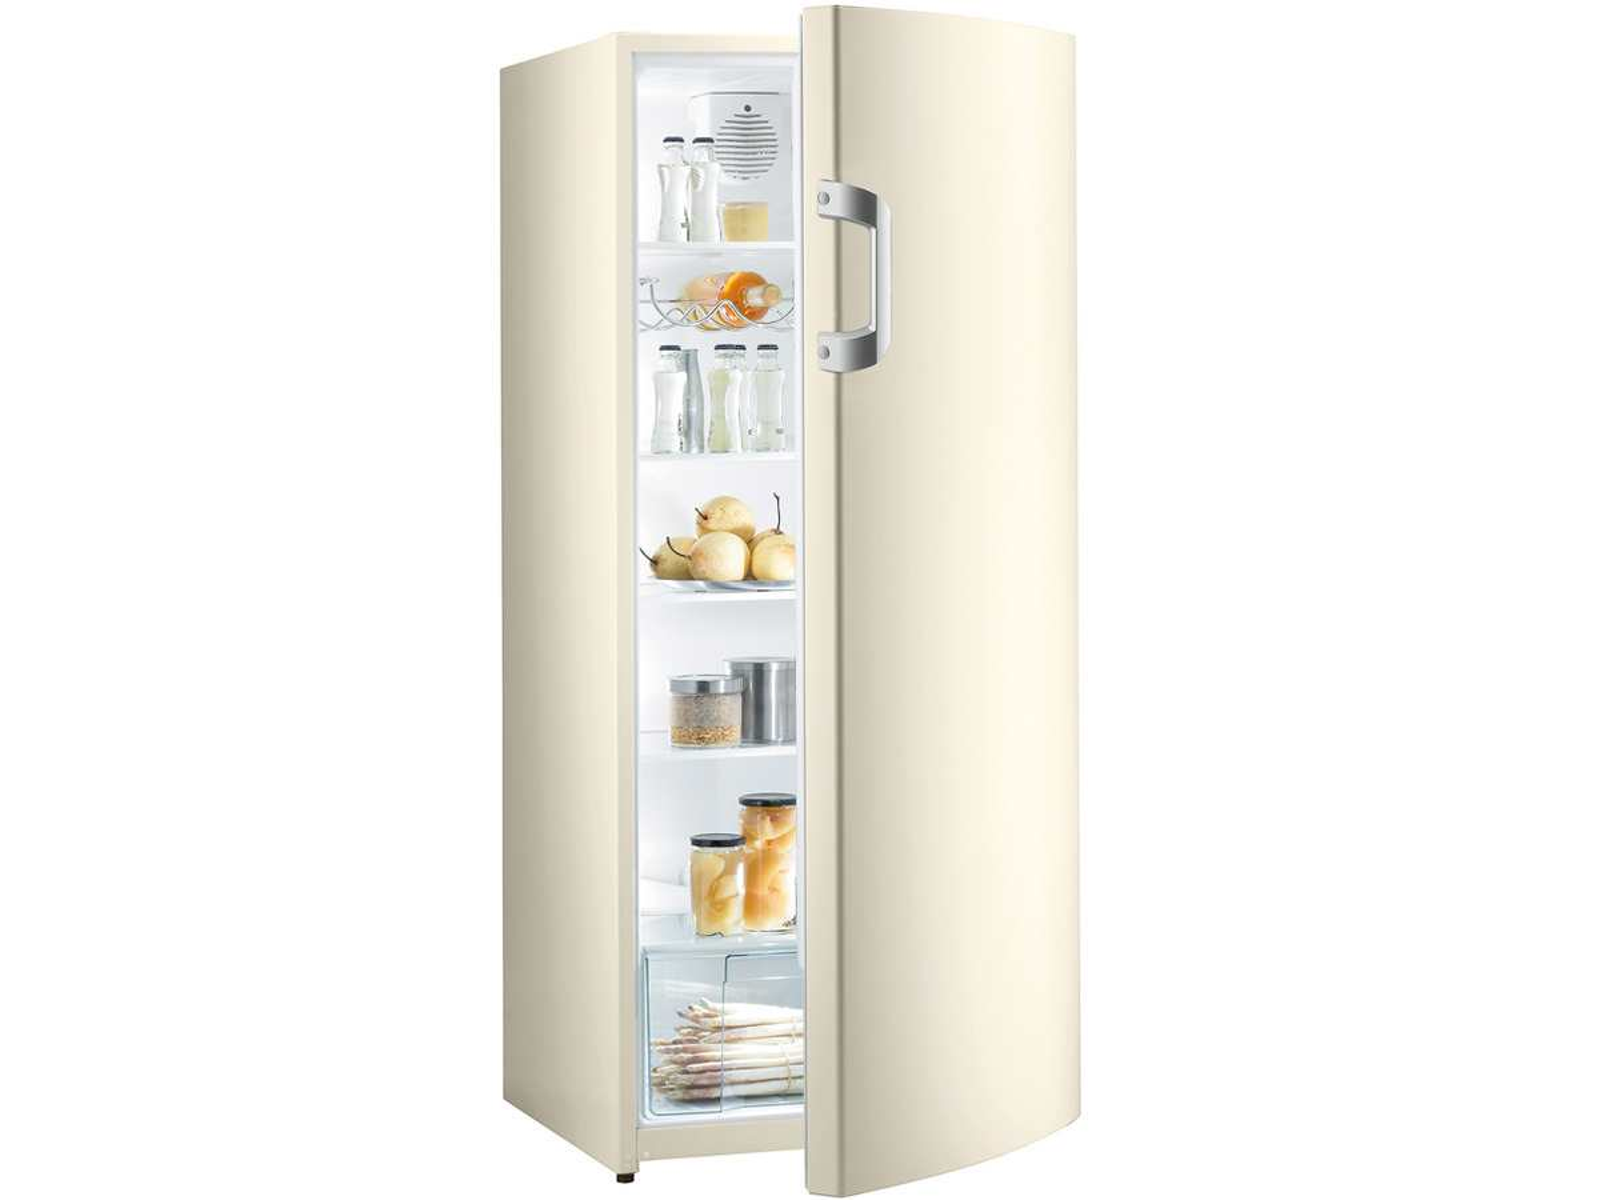 Retro Kühlschrank Creme : Gorenje r bc standkühlschrank creme